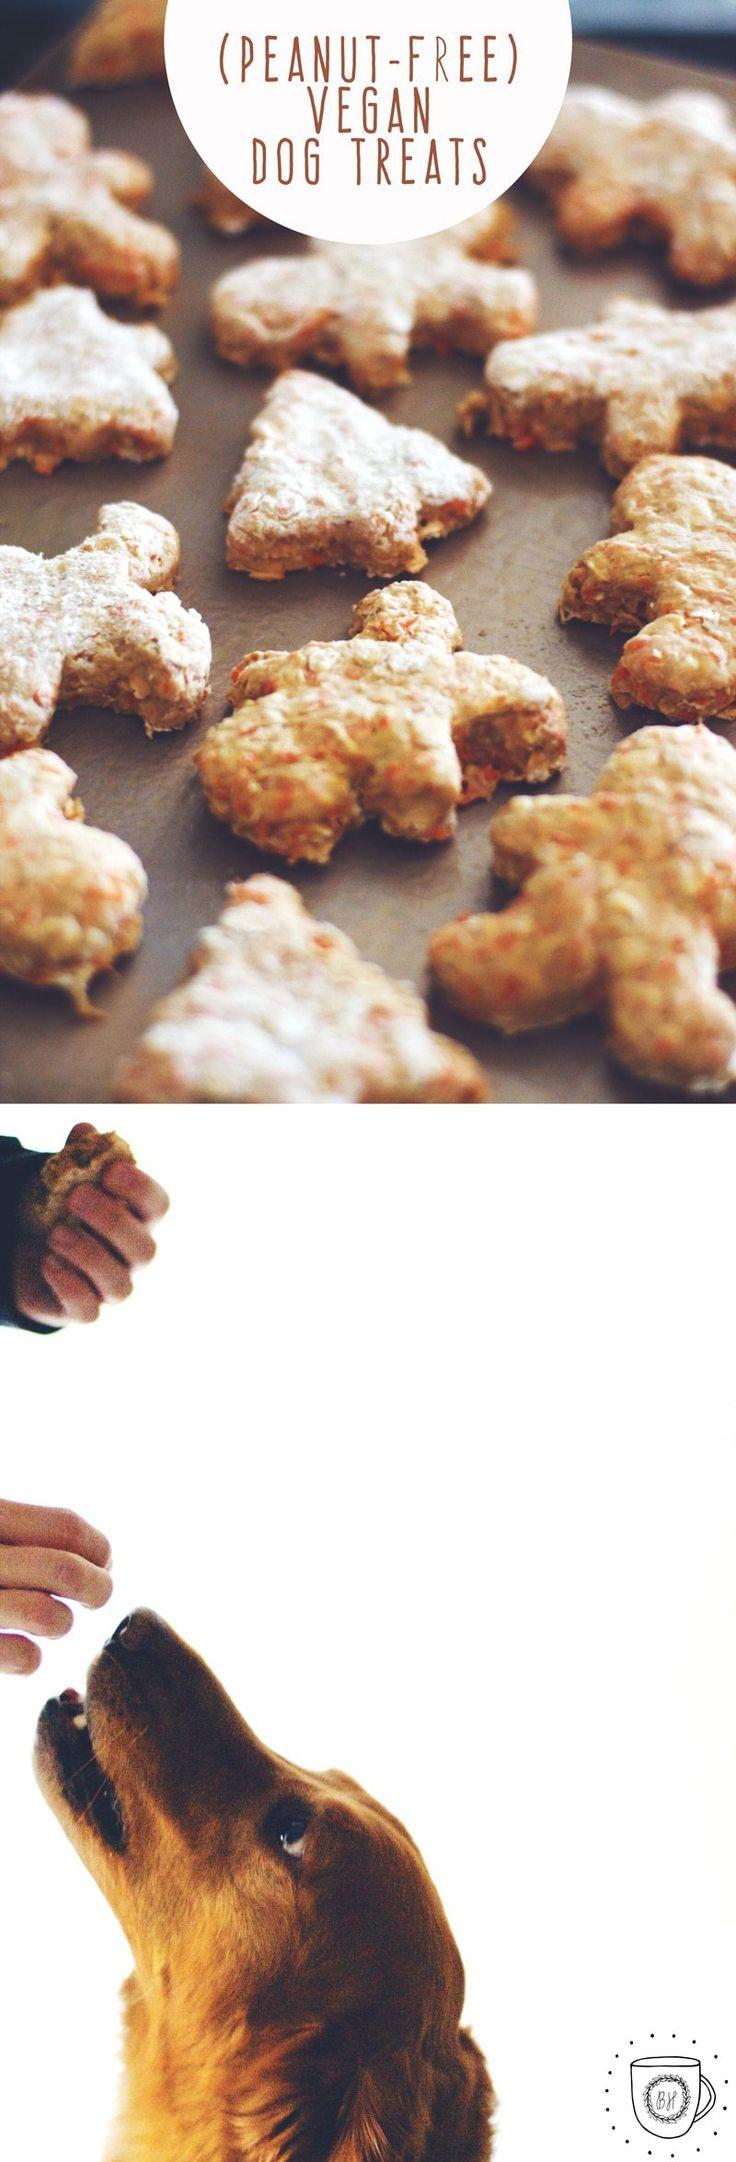 Best 25 vegan dog food ideas on pinterest dog treats vegan dog best 25 vegan dog food ideas on pinterest dog treats vegan dog biscuit recipe and organic dog food sciox Gallery